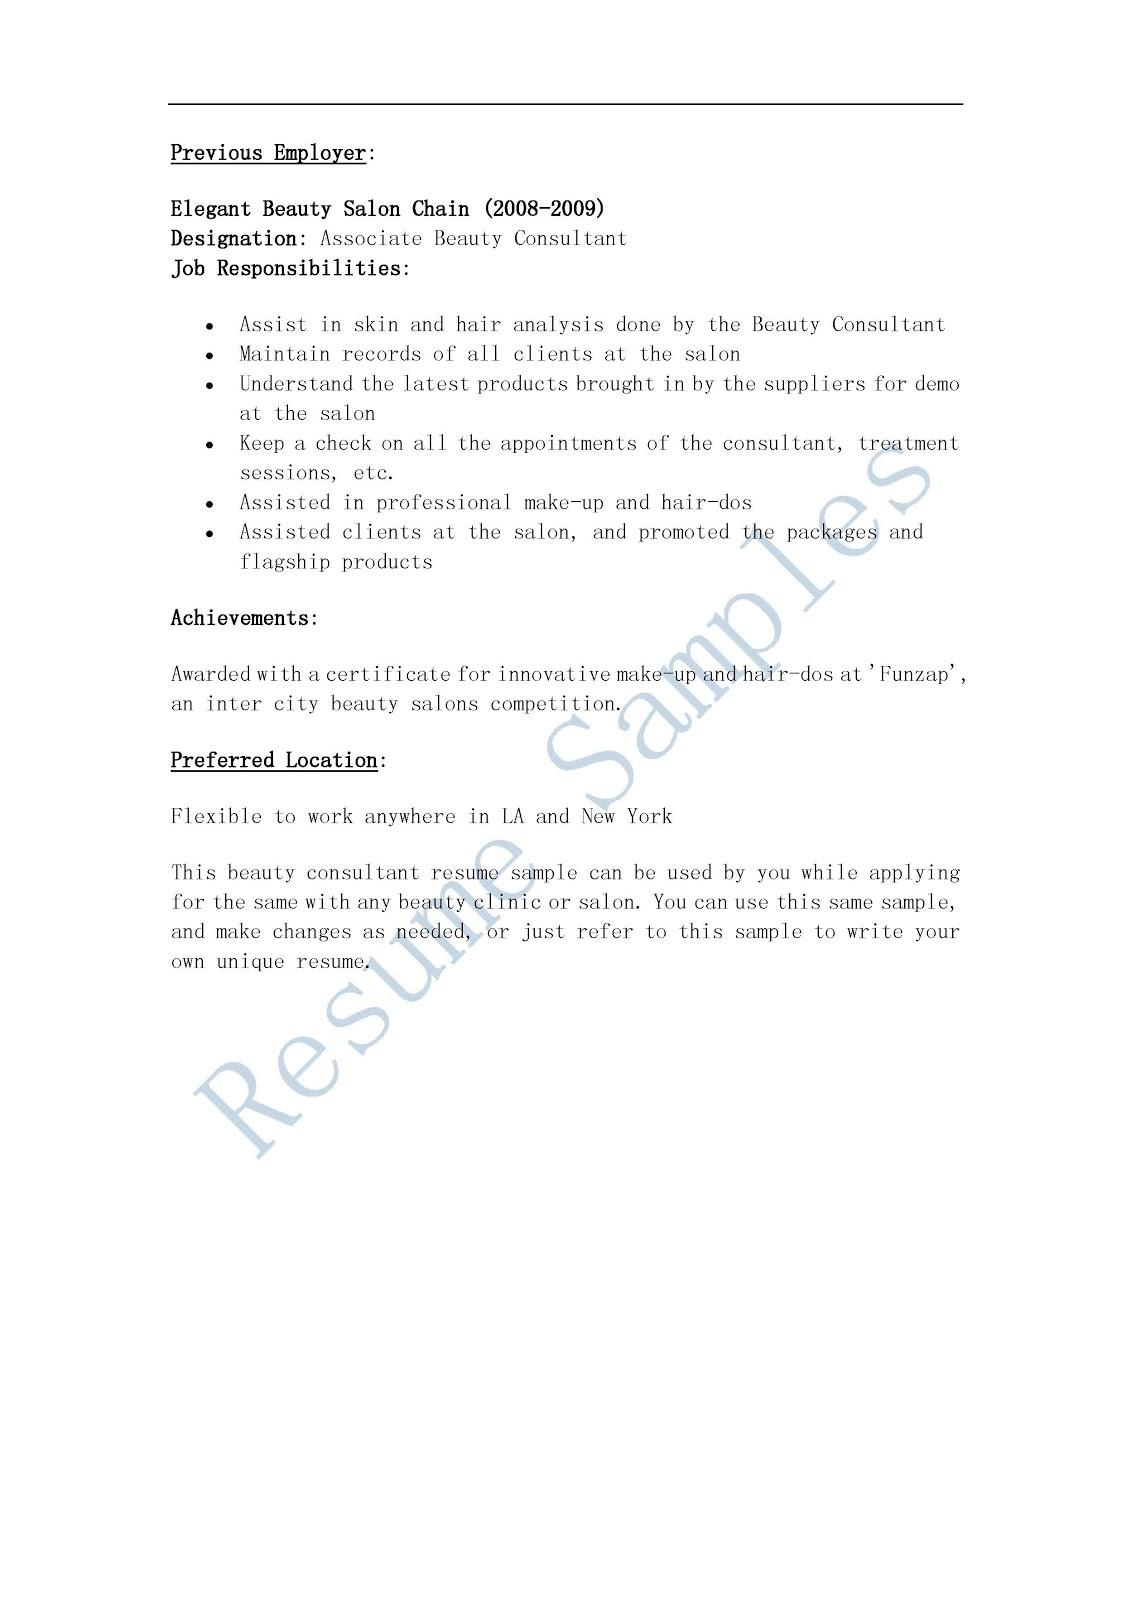 cosmetology resume templates - solarfm.tk